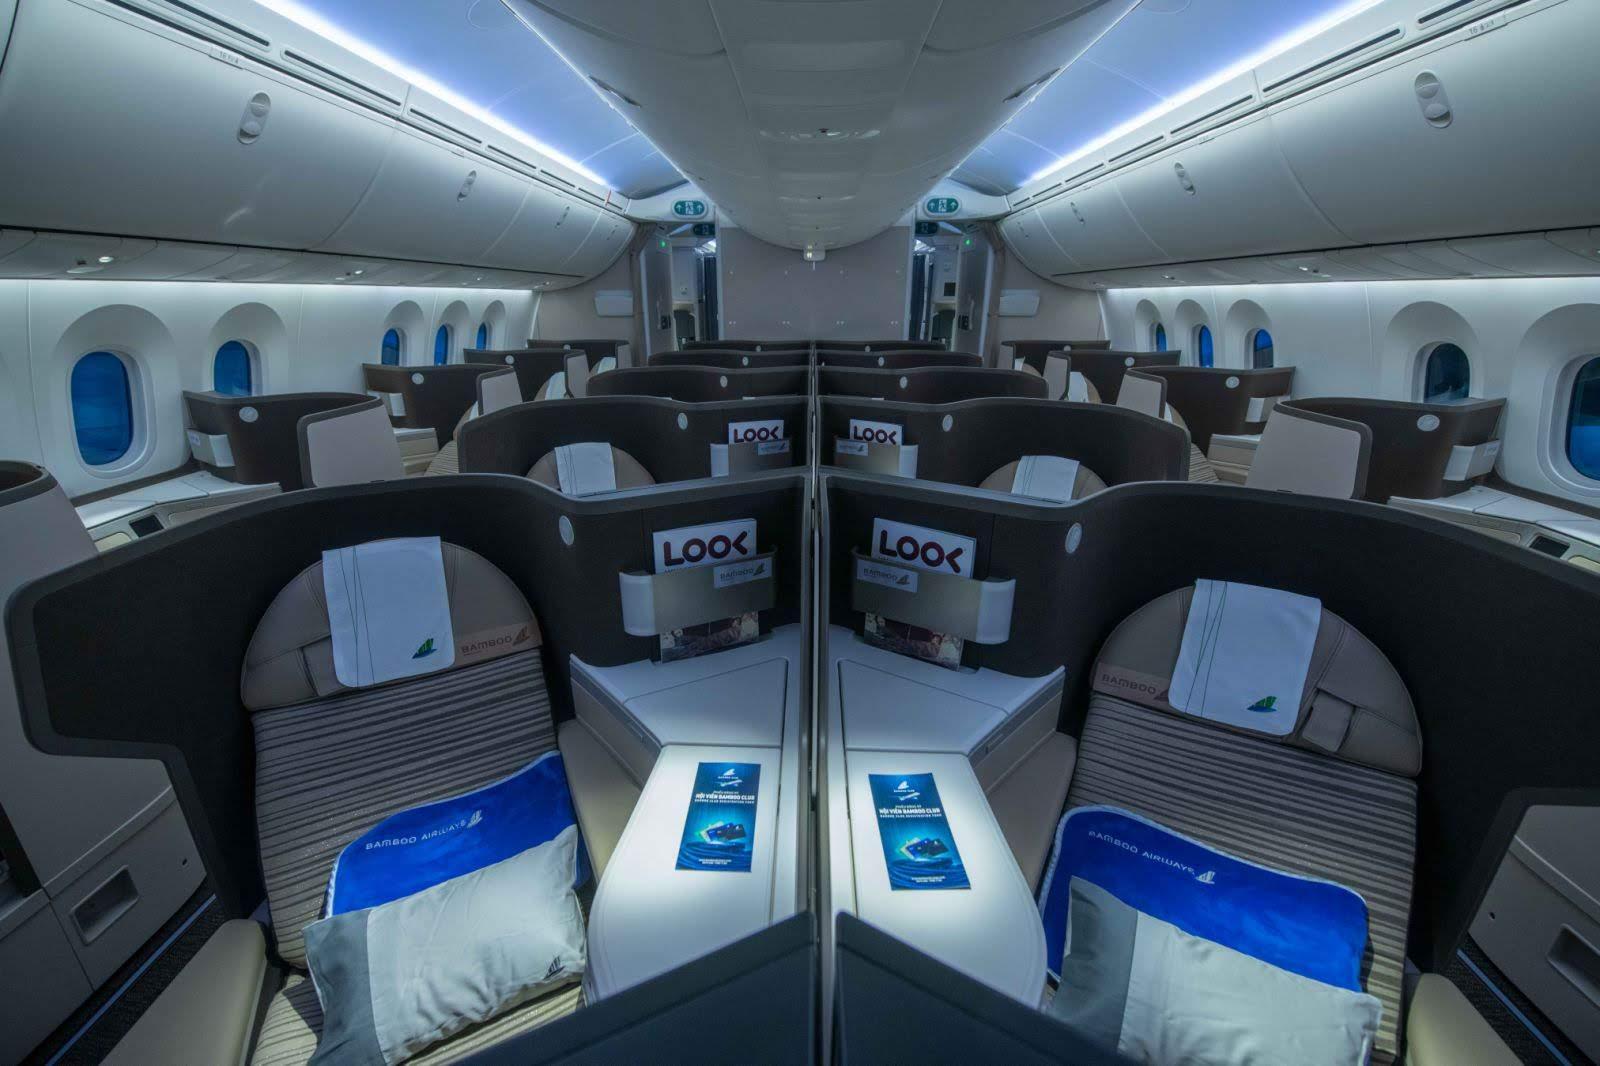 Bamboo Airways sẽ khai thác 4 máy bay Boeing 787-9 Dreamliner 4